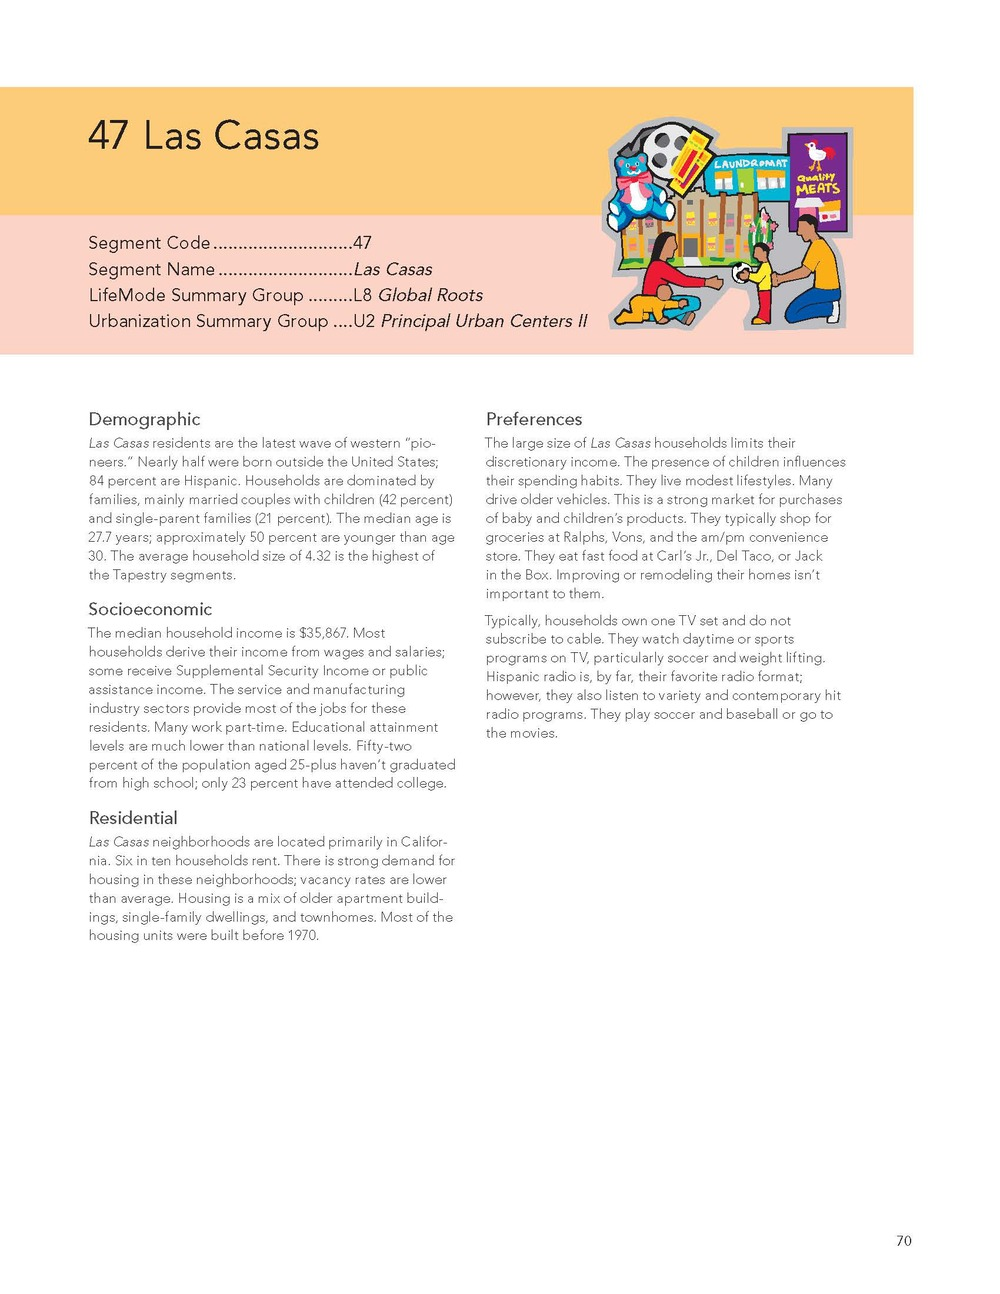 tapestry-segmentation_Page_73.jpg